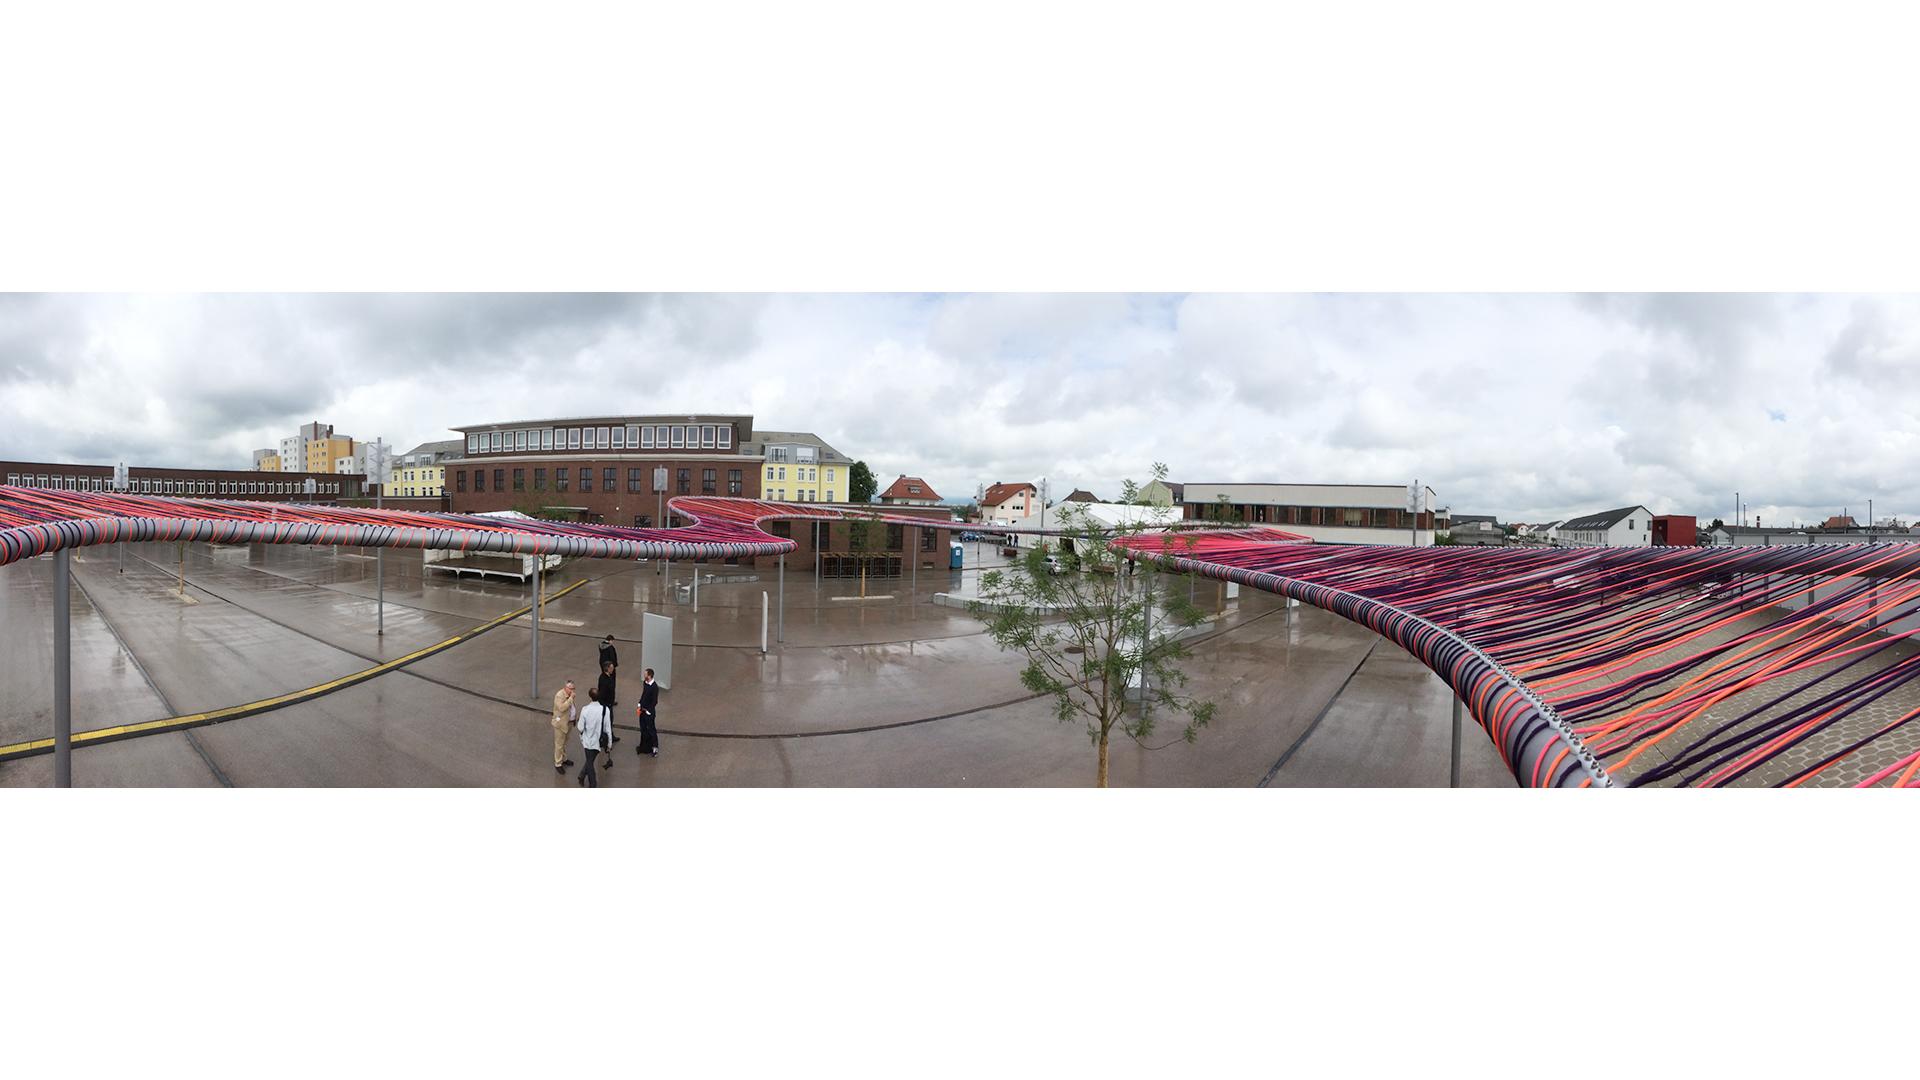 Graf-de-Chardonnet Platz, Kelsterbach | Sauerzapfe Architekten